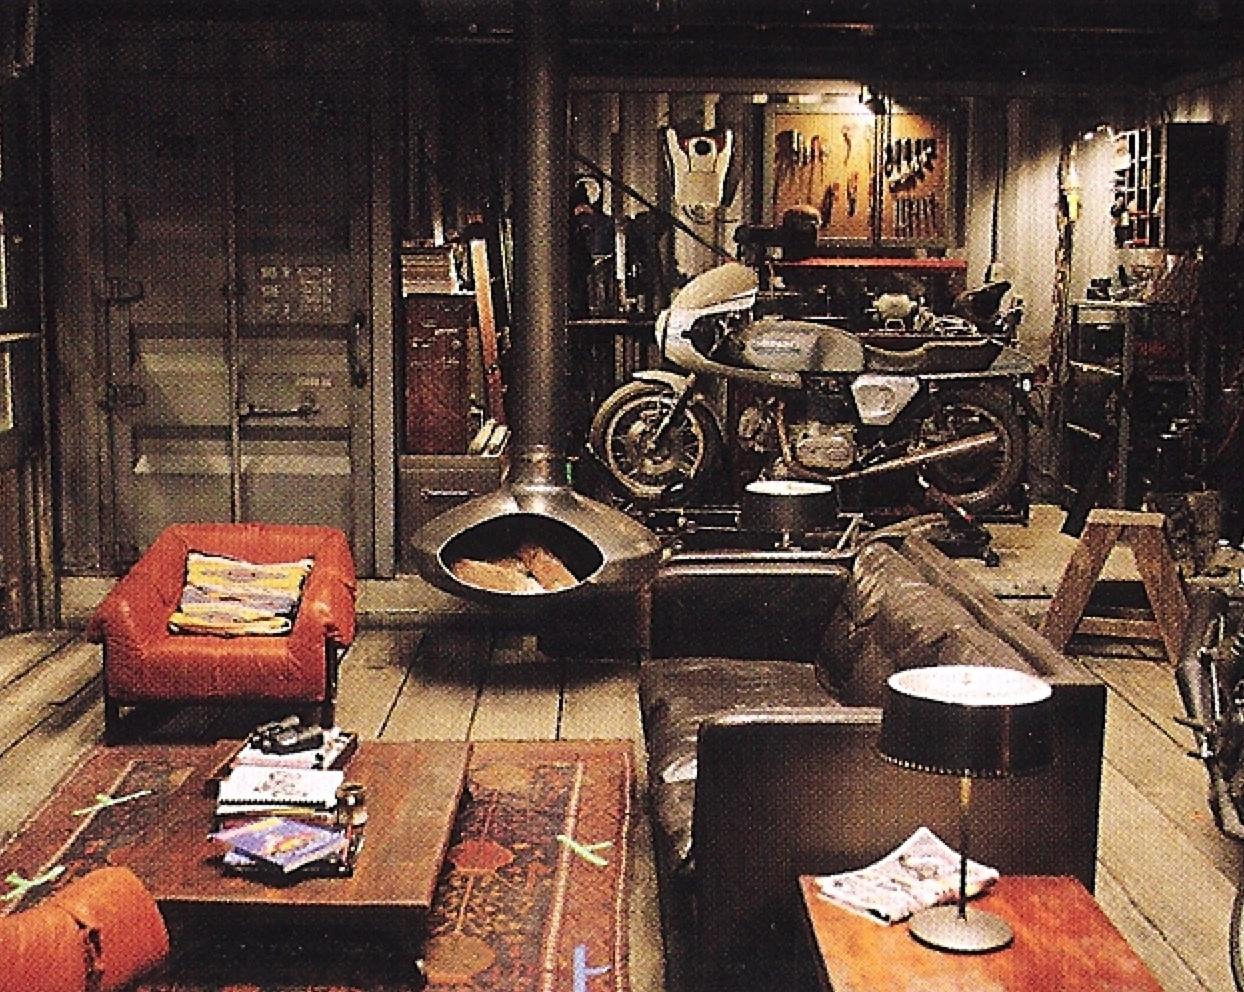 ride the machine. Black Bedroom Furniture Sets. Home Design Ideas